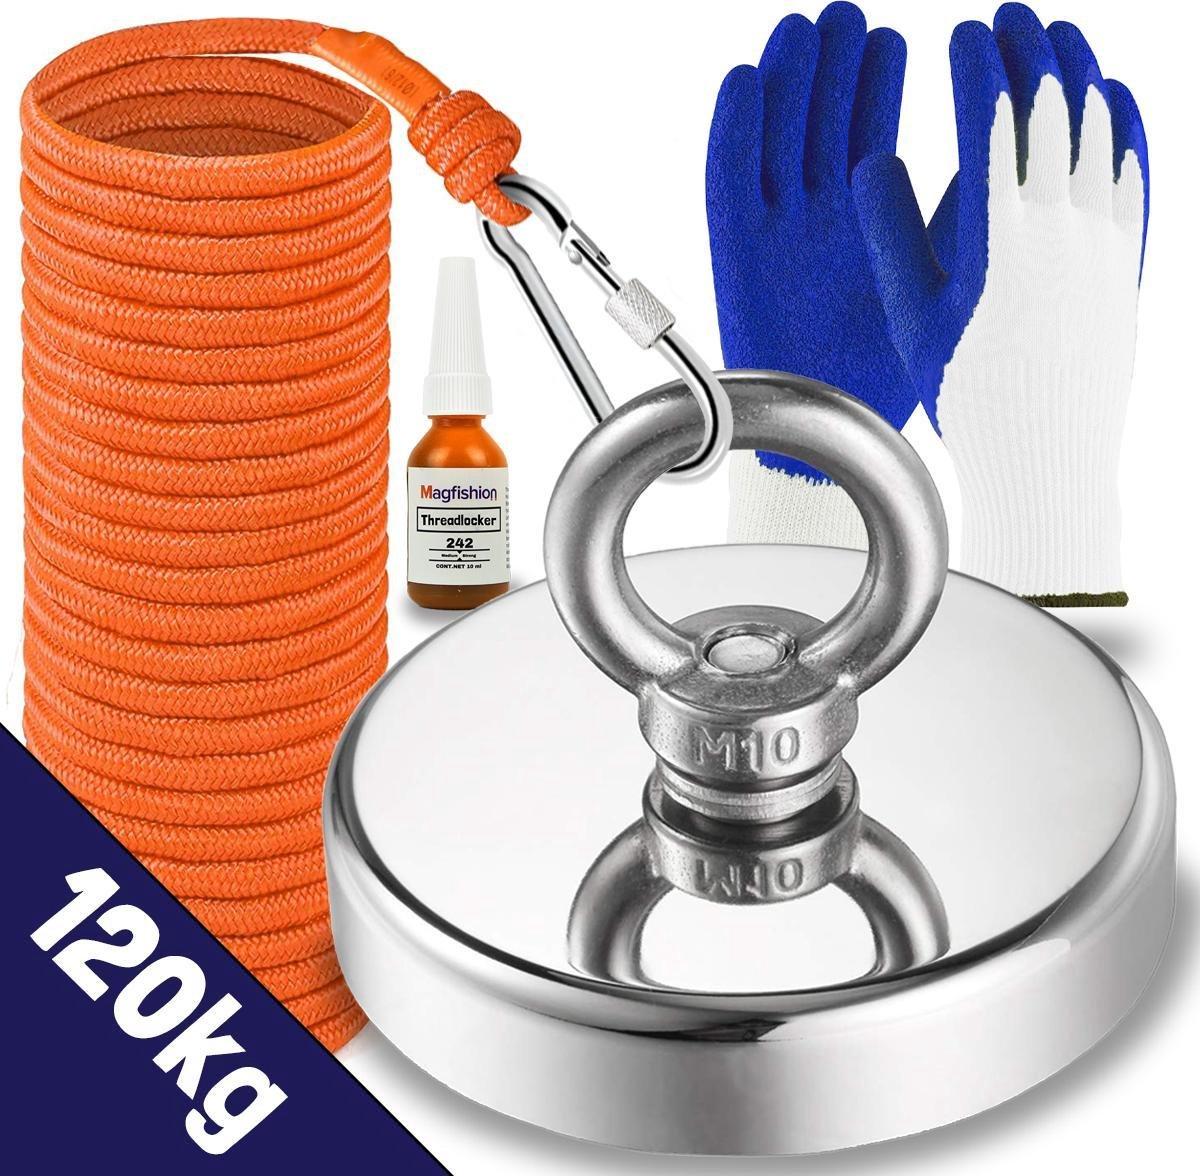 Magfishion® Vismagneet Set - 120 KG - Magneetvissen - 20m Touw + Karabijnhaak met Schroefsluiting -